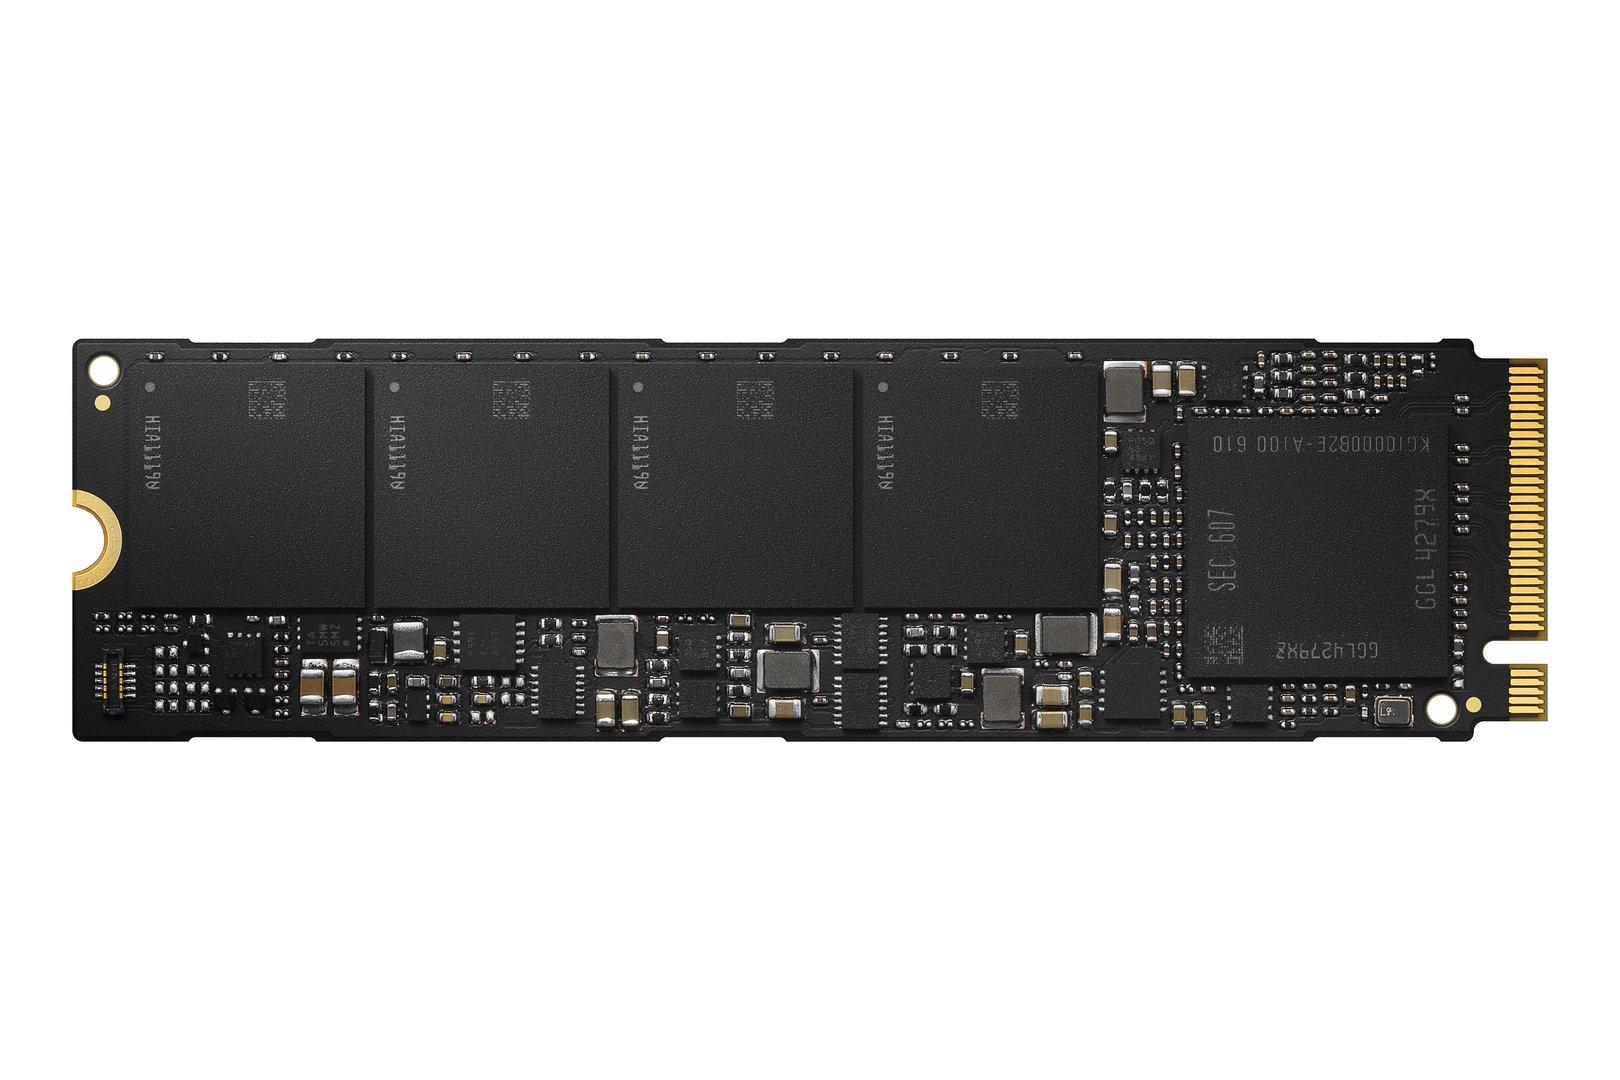 Samsung SSD 960 Pro